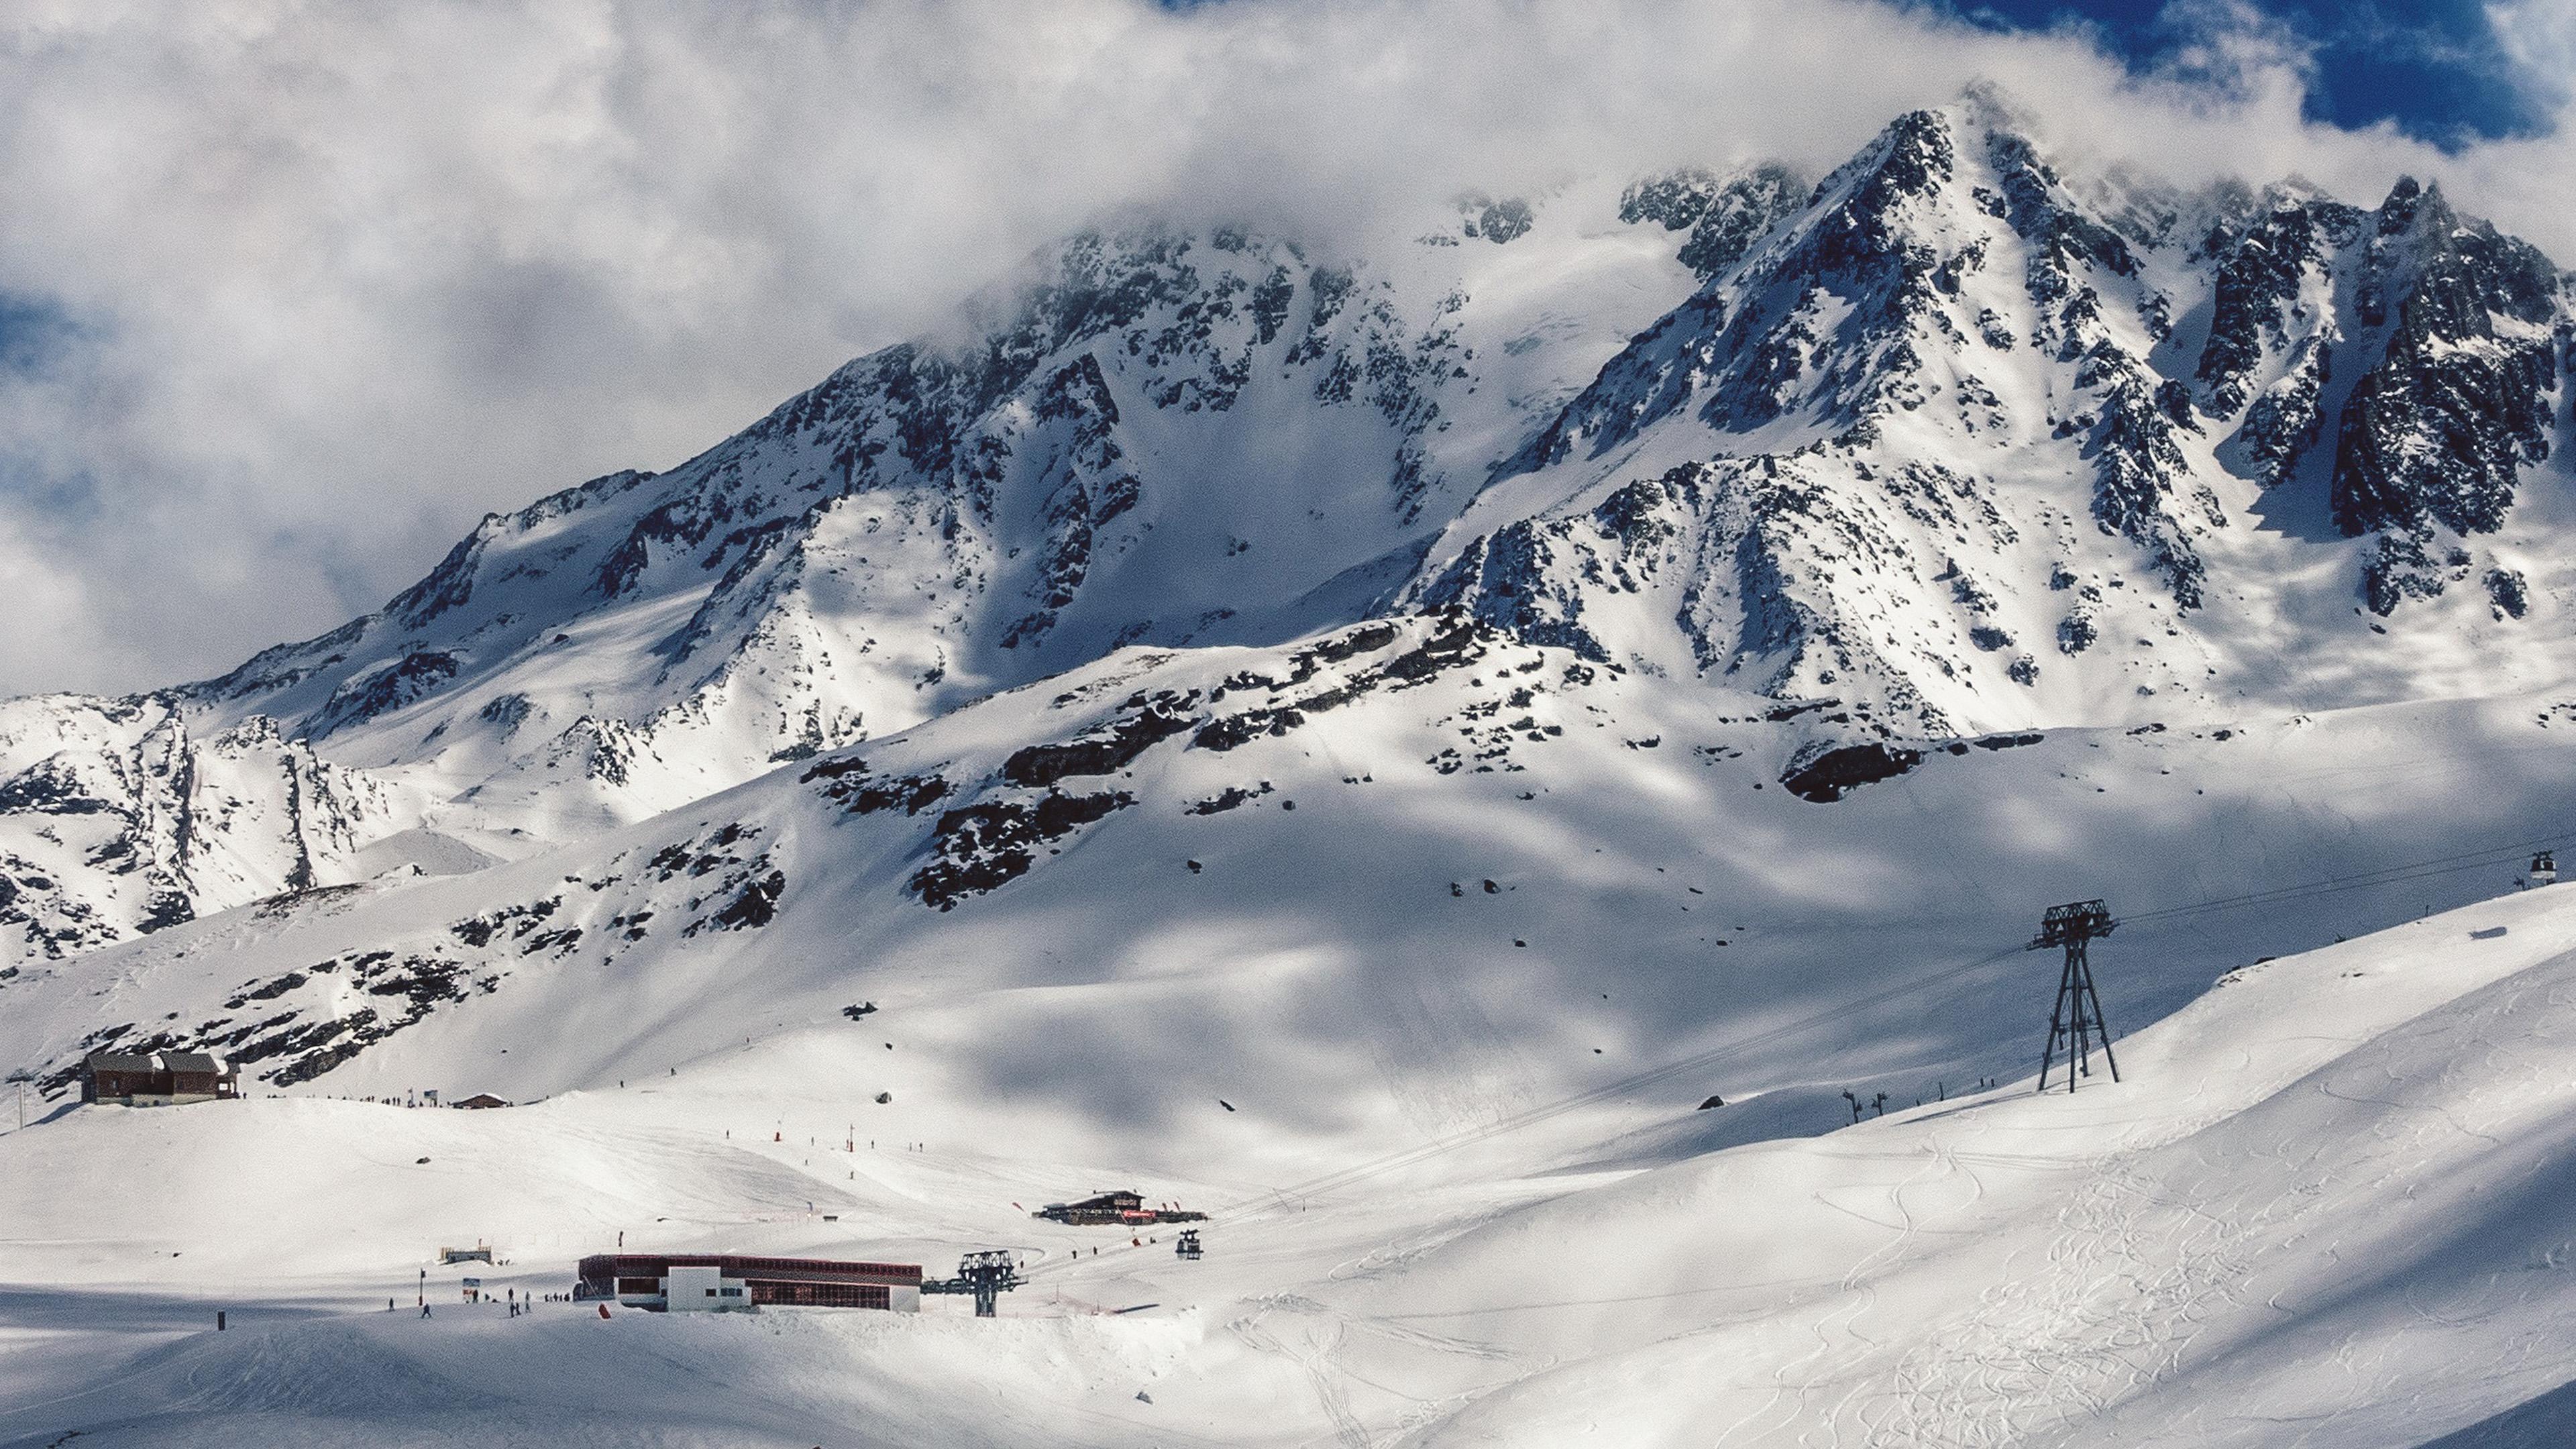 Nn05 Snow Mountain Winter Nature